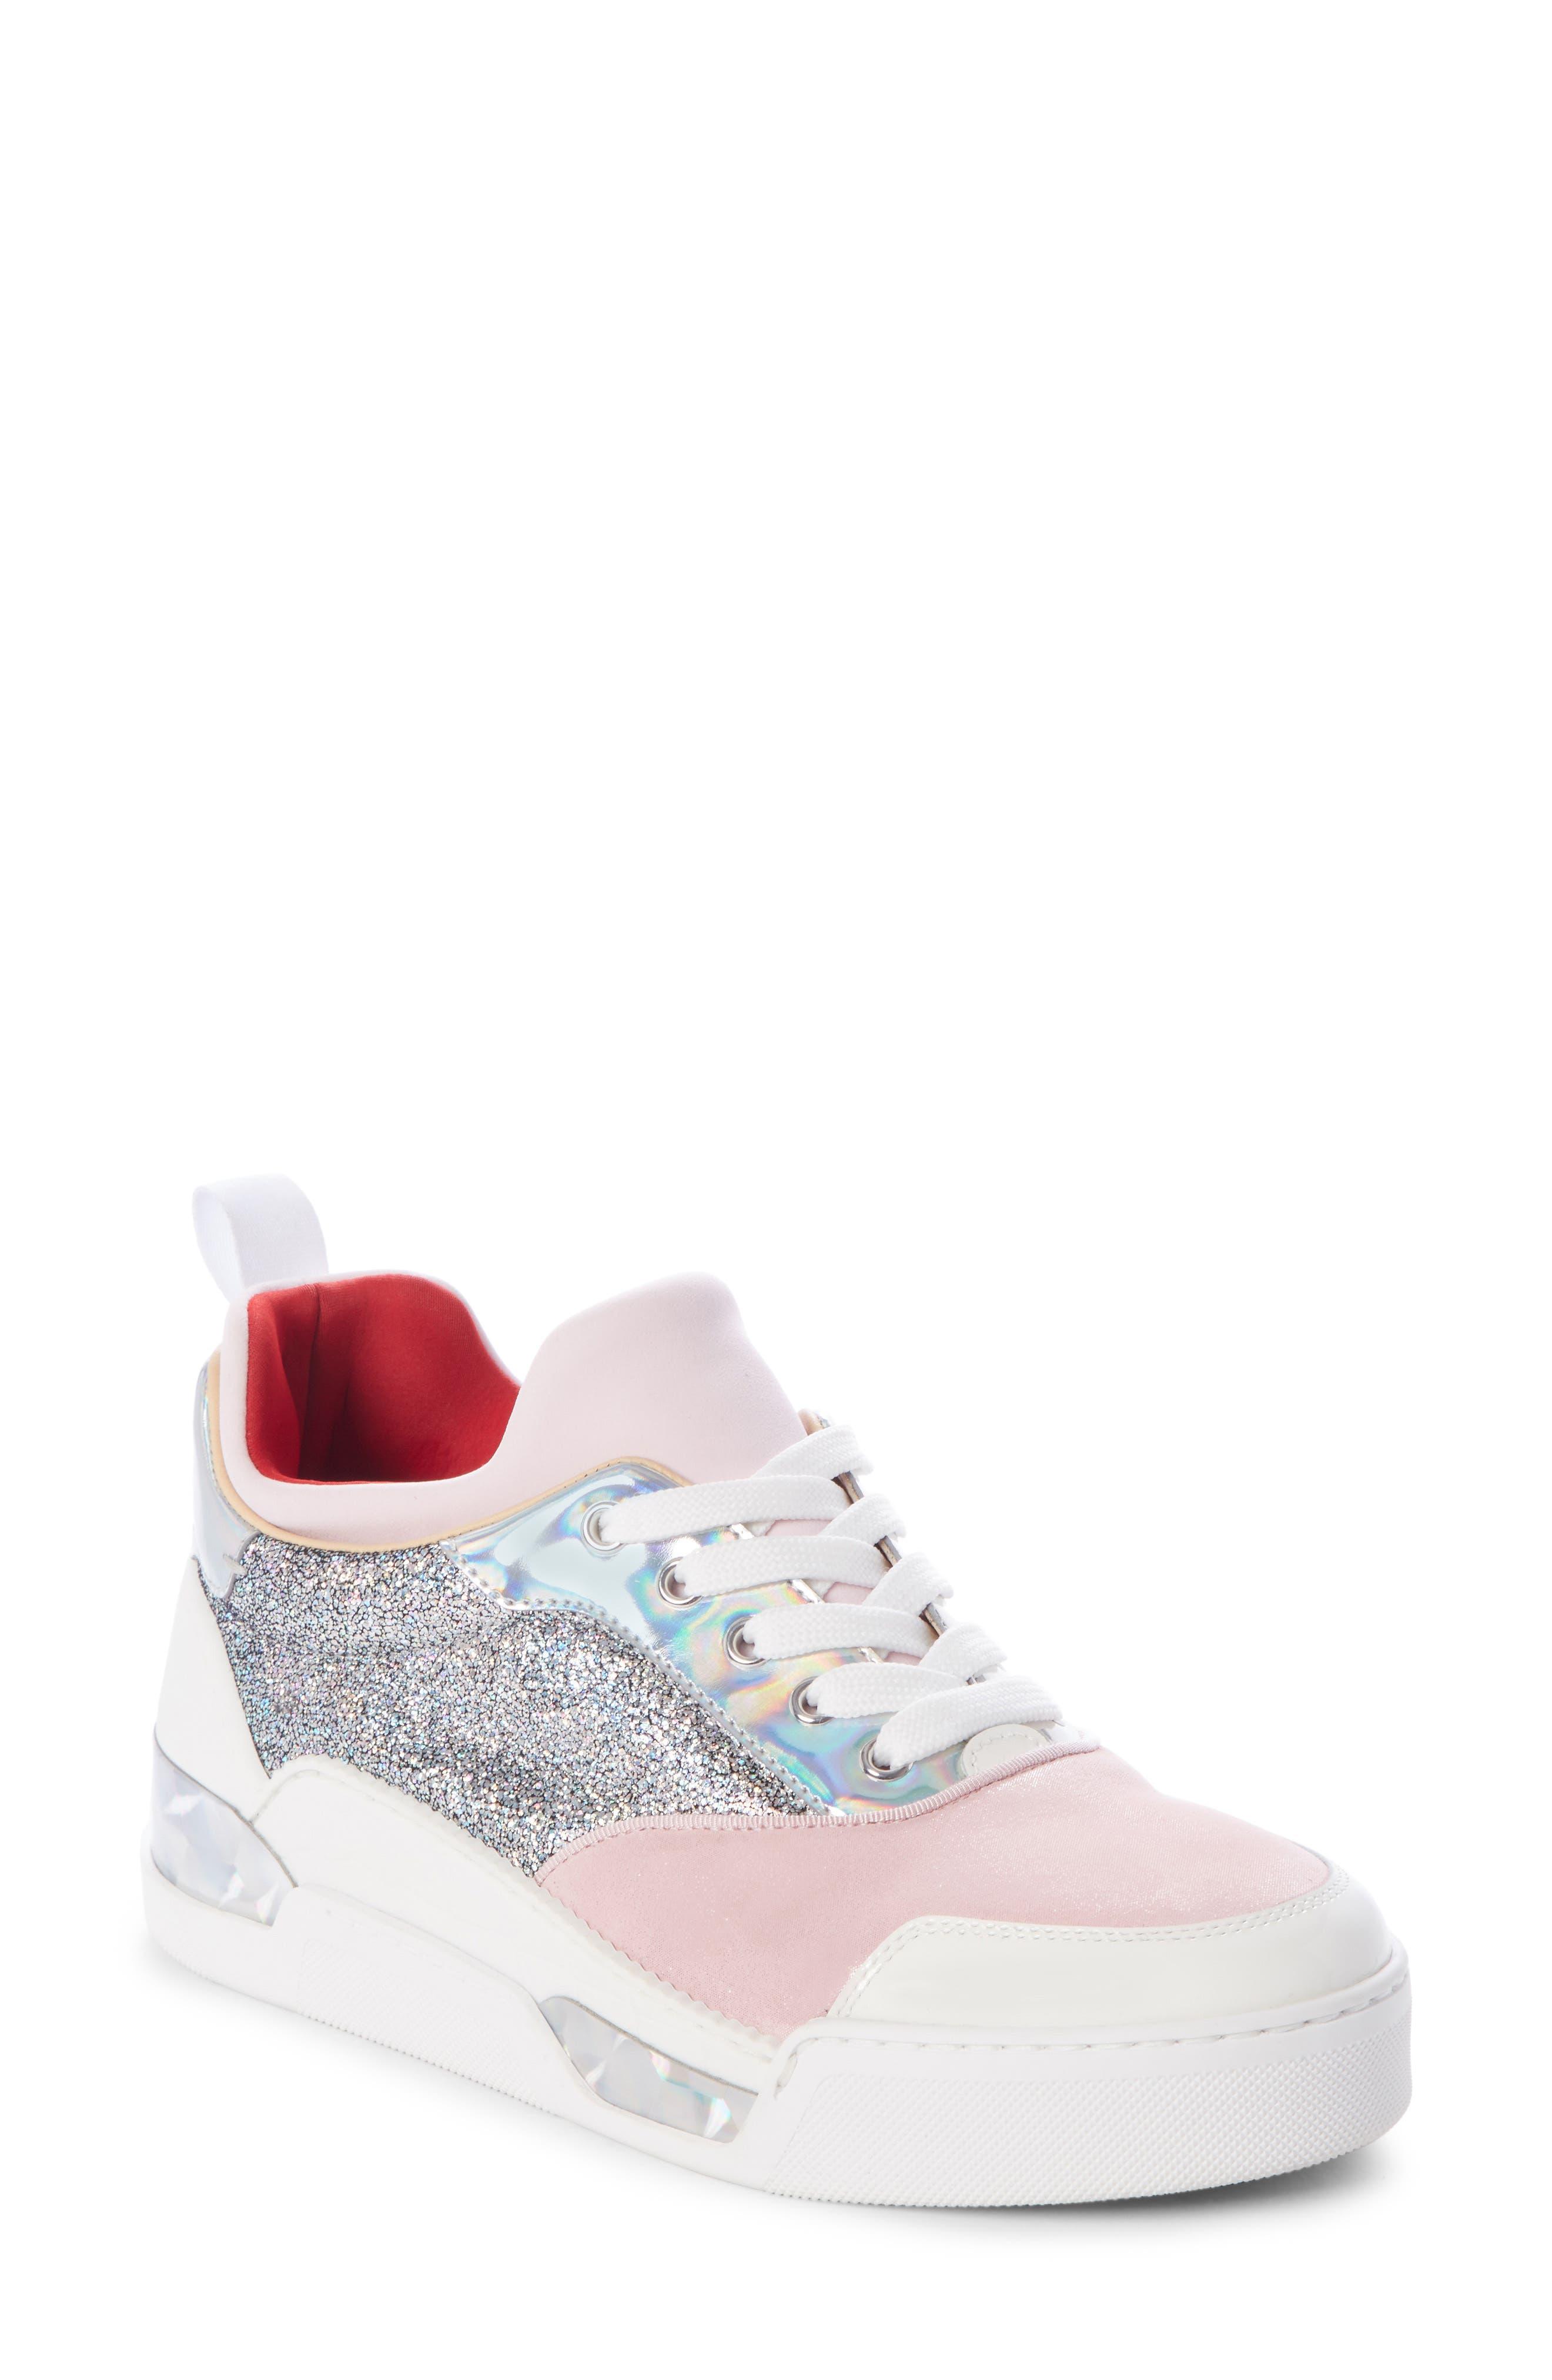 Aurelien Women'S Multimedia Low-Top Sneakers in Pink/ White